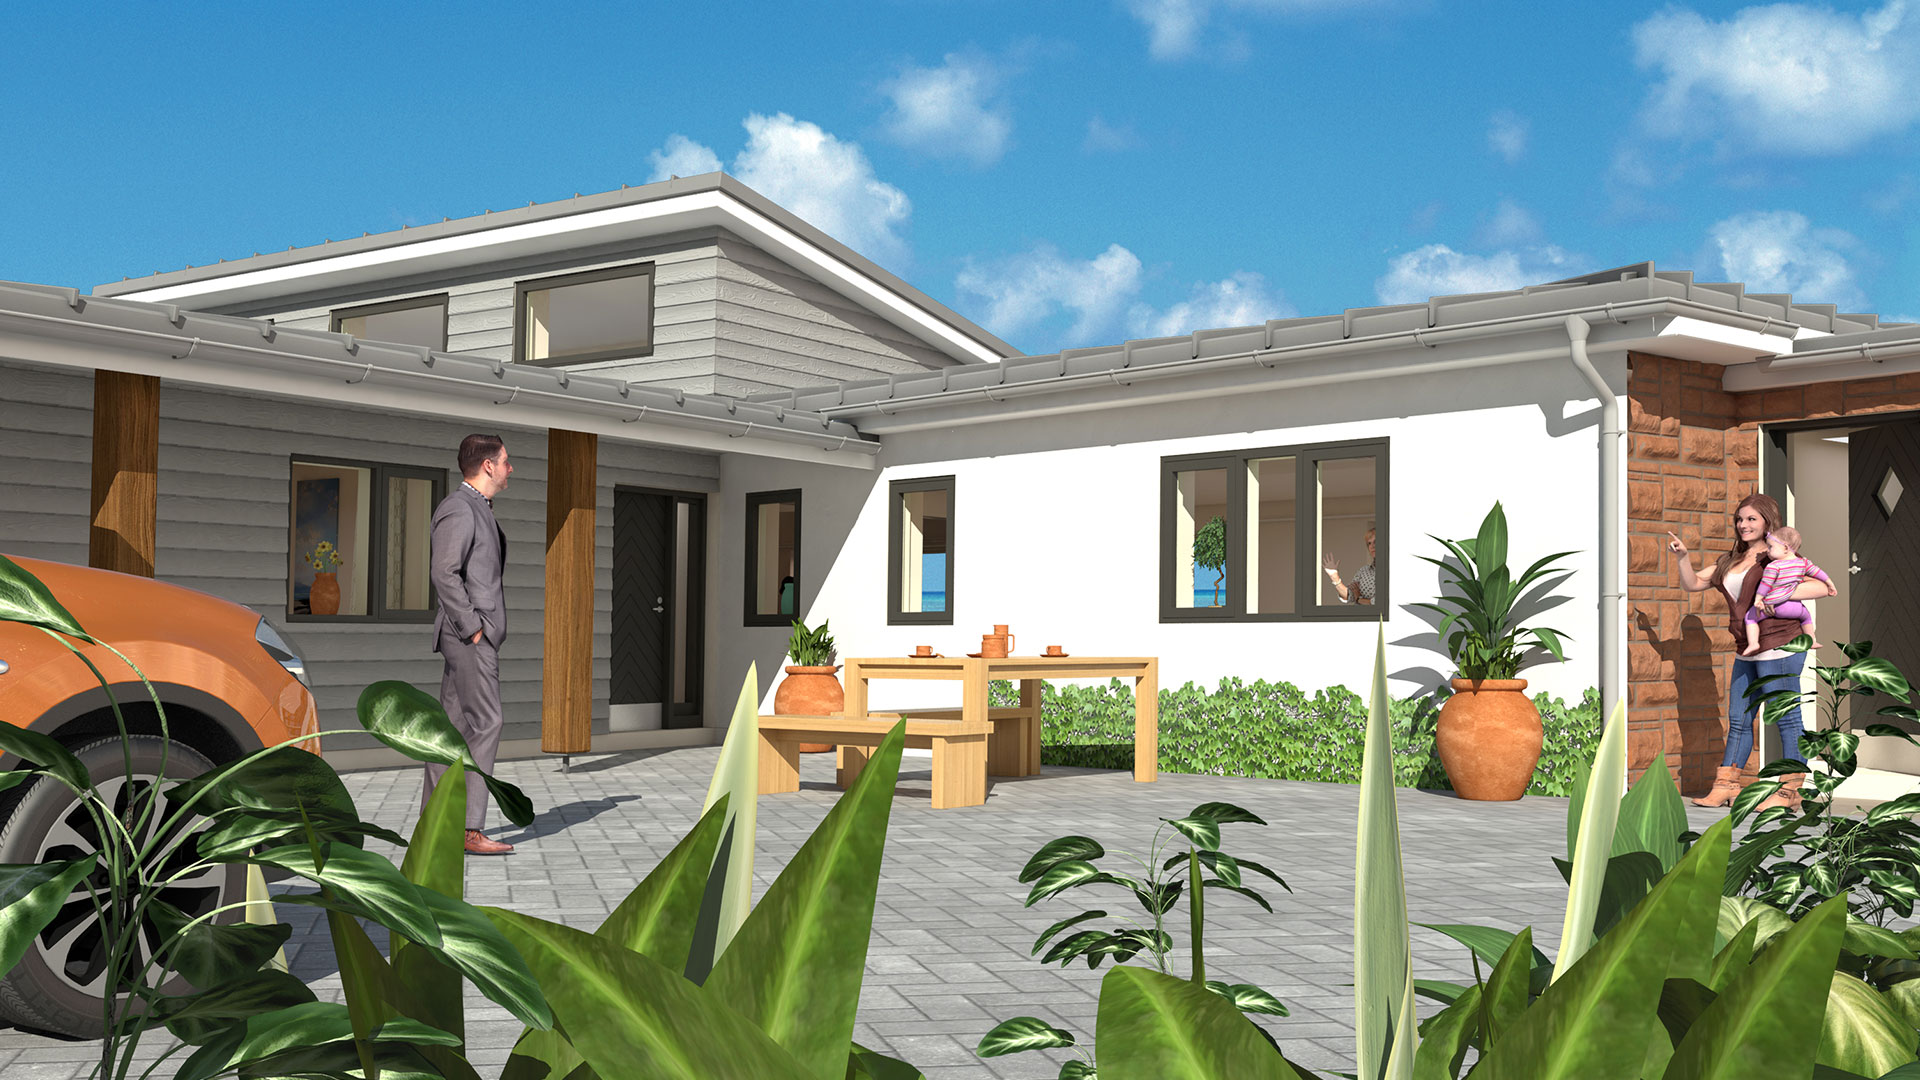 building developer image of proposed house